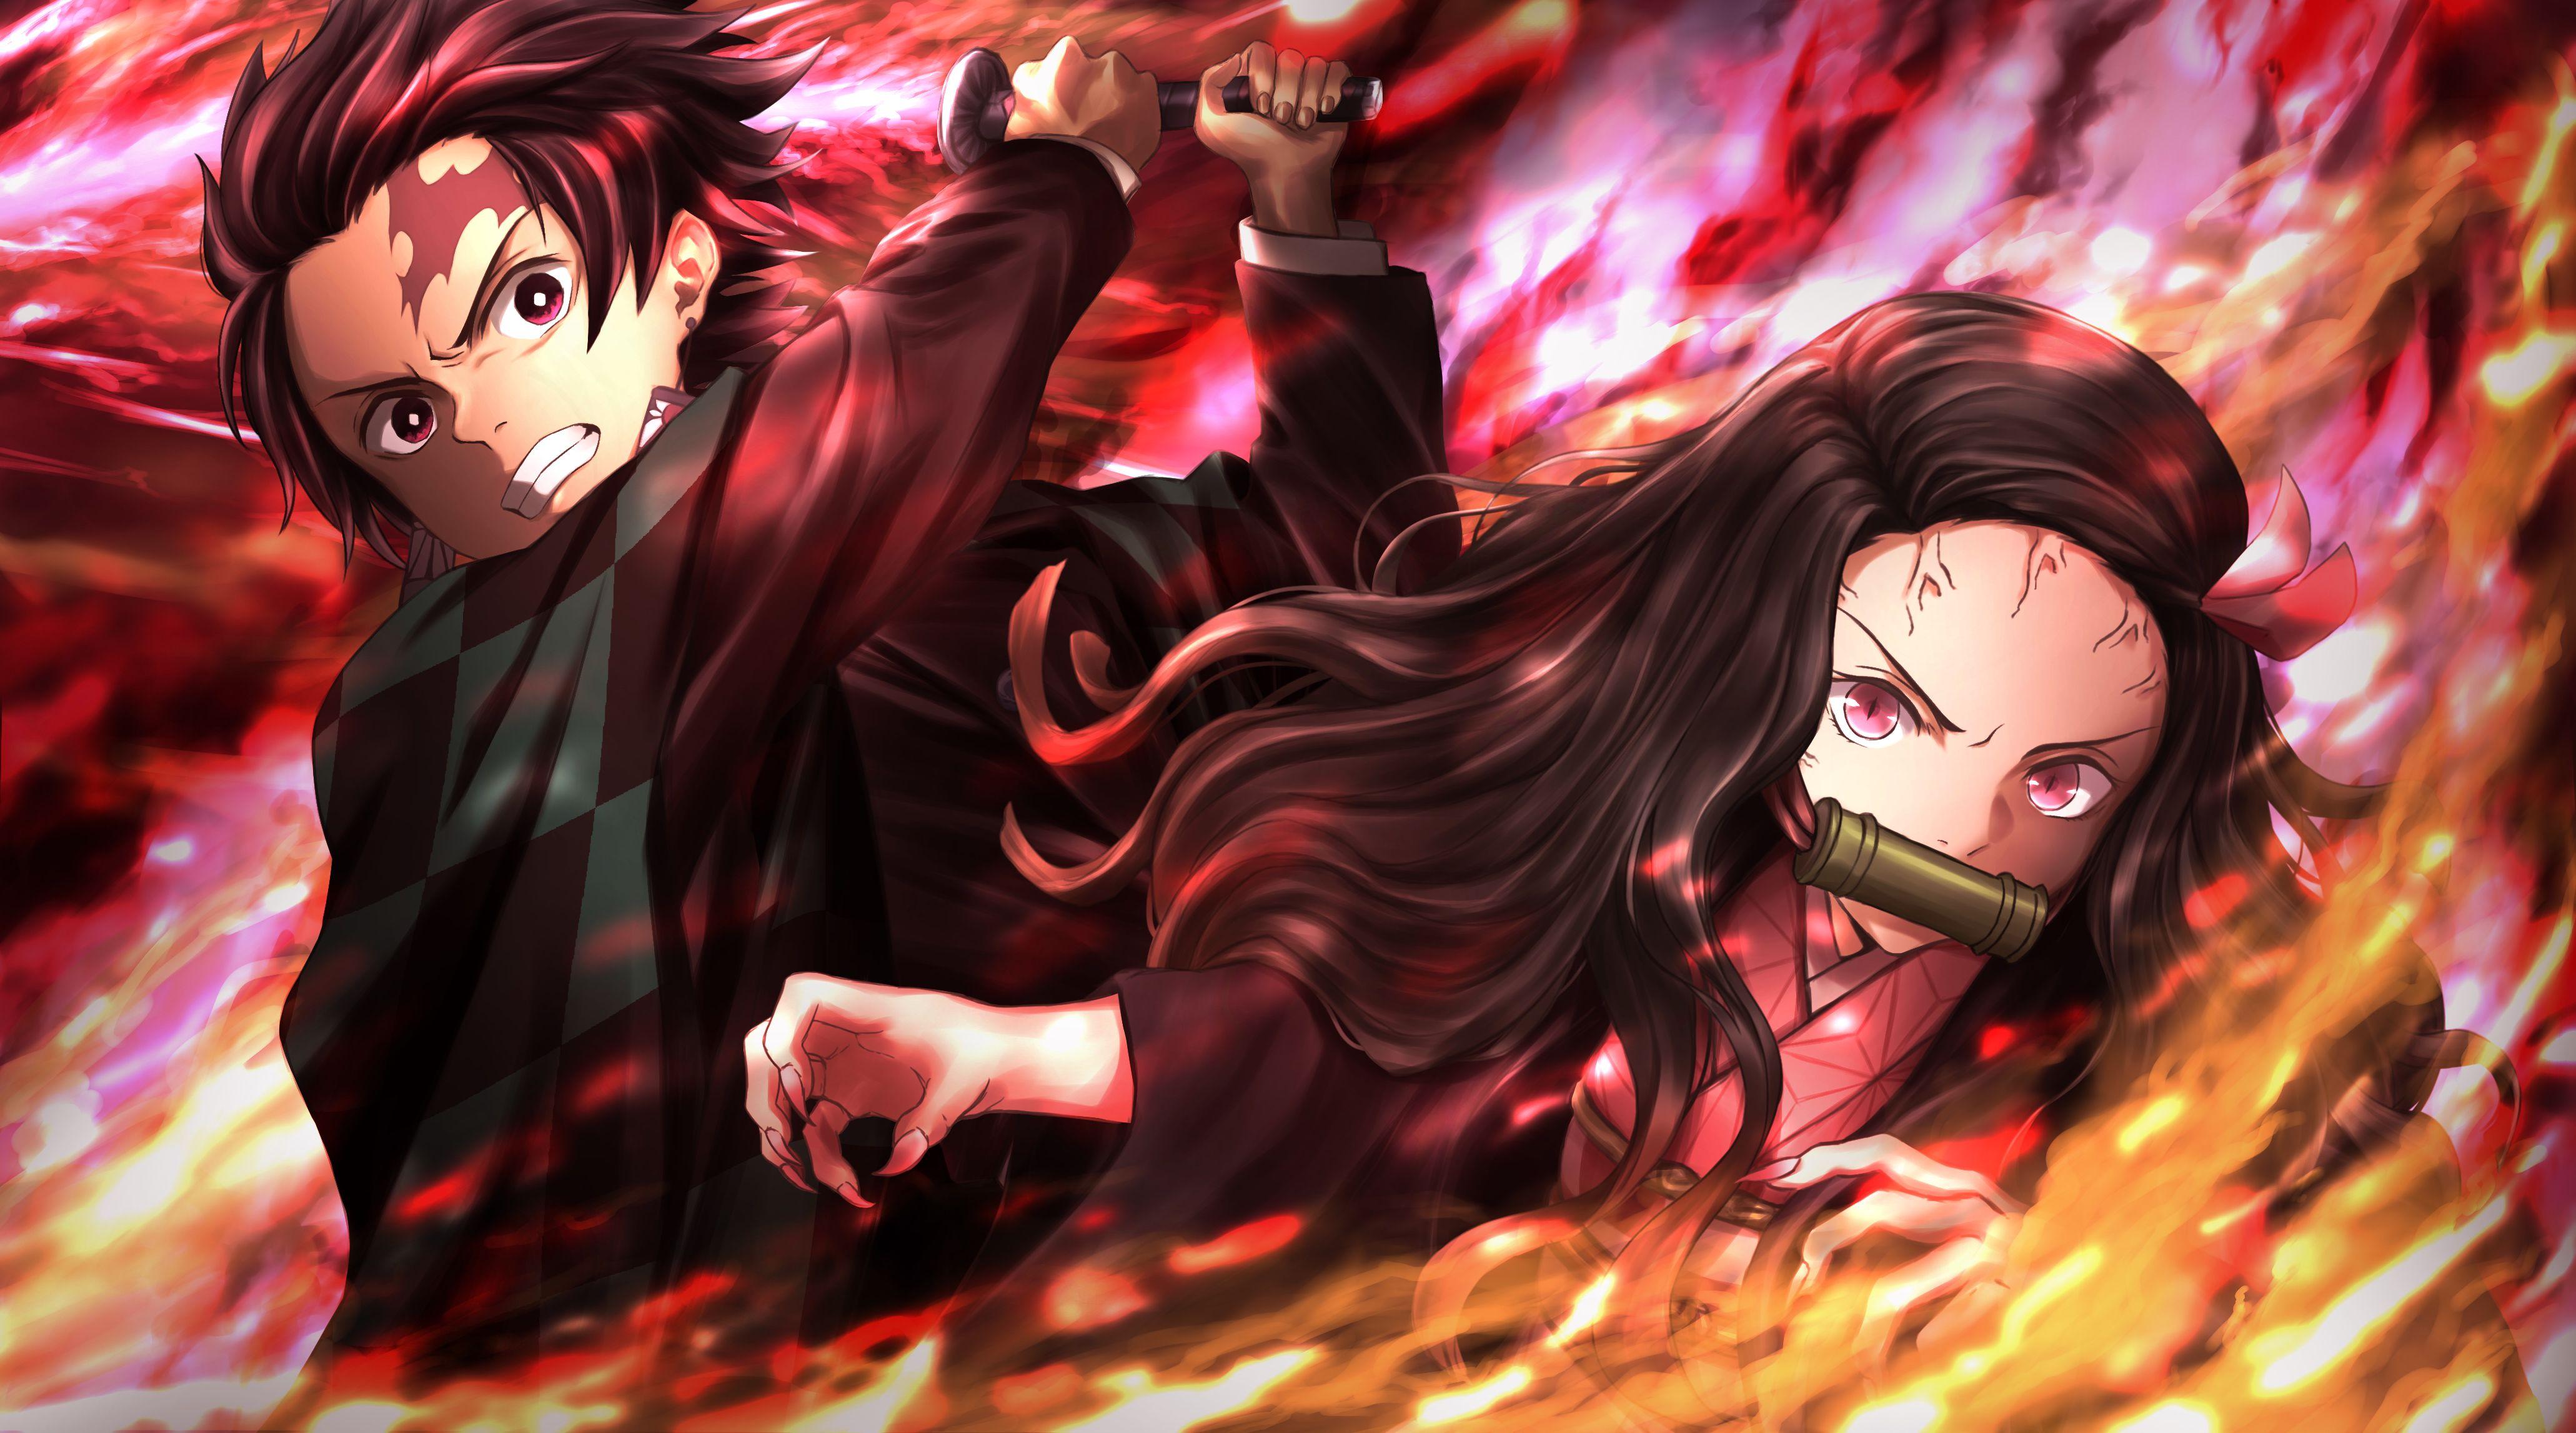 Desktop HD Anime Demon Slayer Wallpapers - Wallpaper Cave